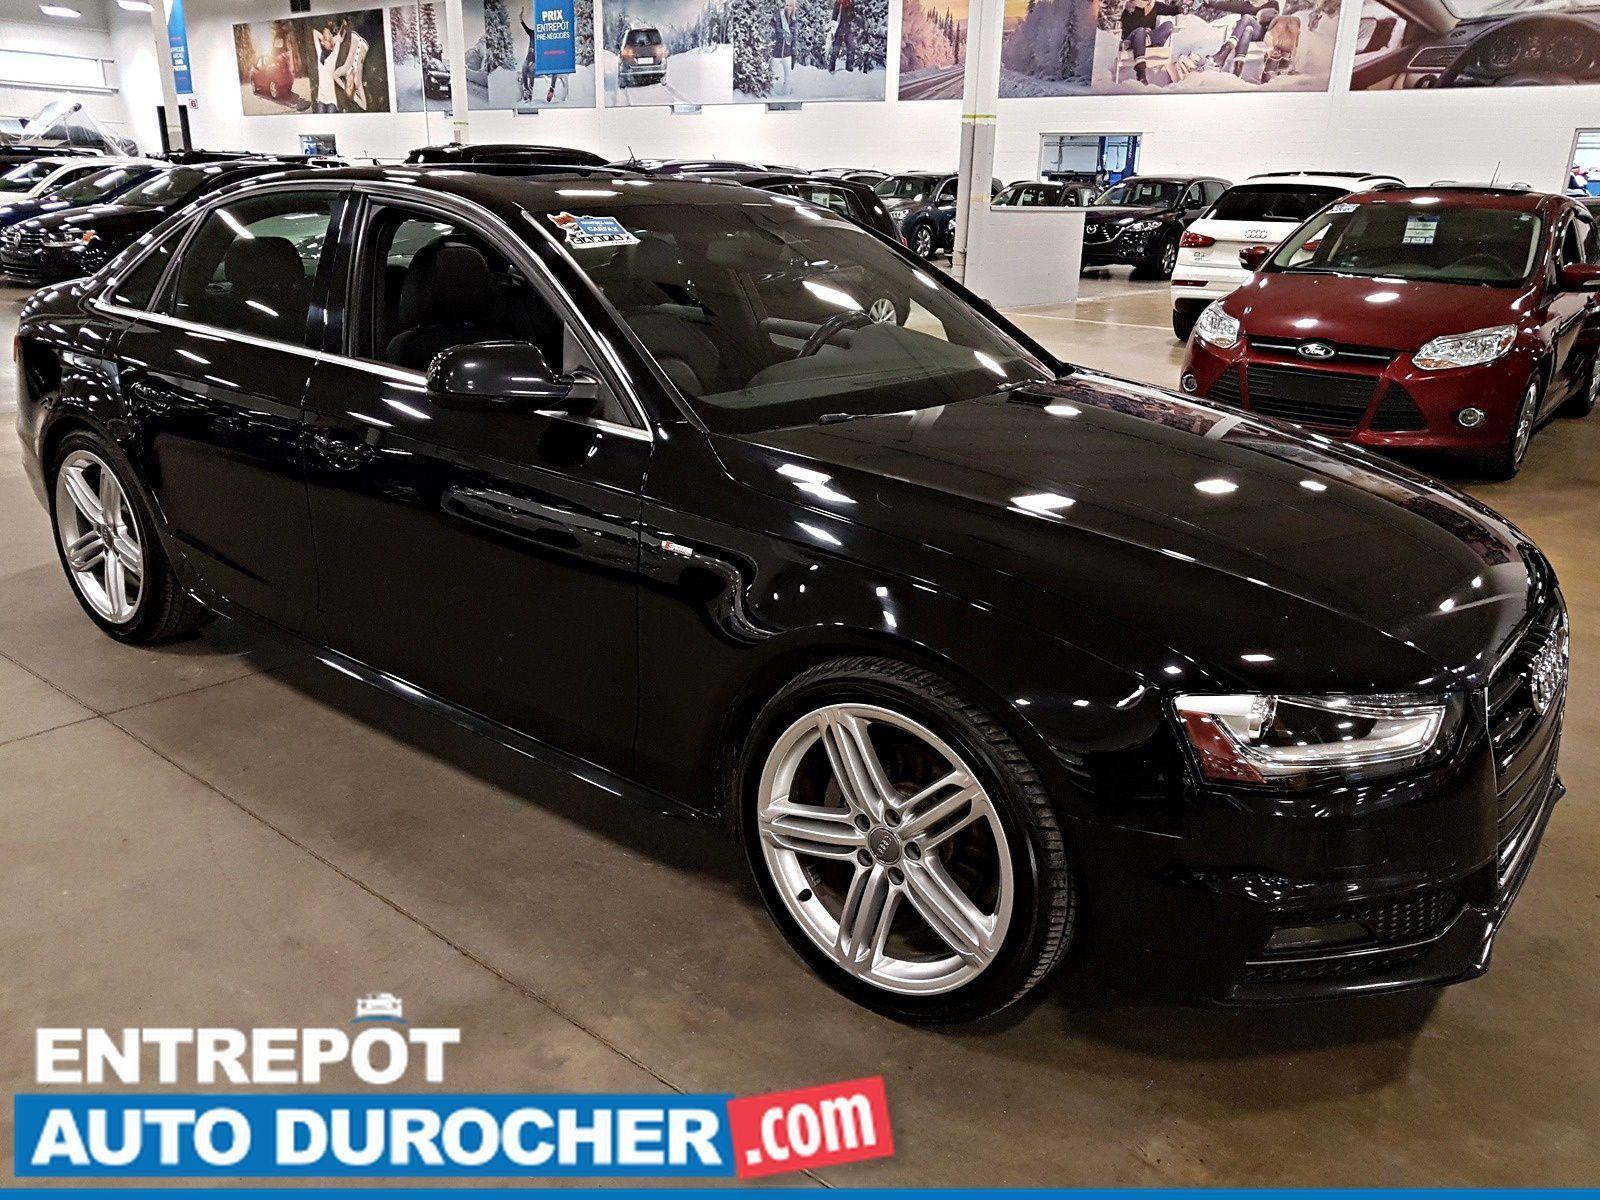 2015 Audi A4 Progressiv plus 4X4 NAVIGATION - A/C - Cuir - Heated Seats